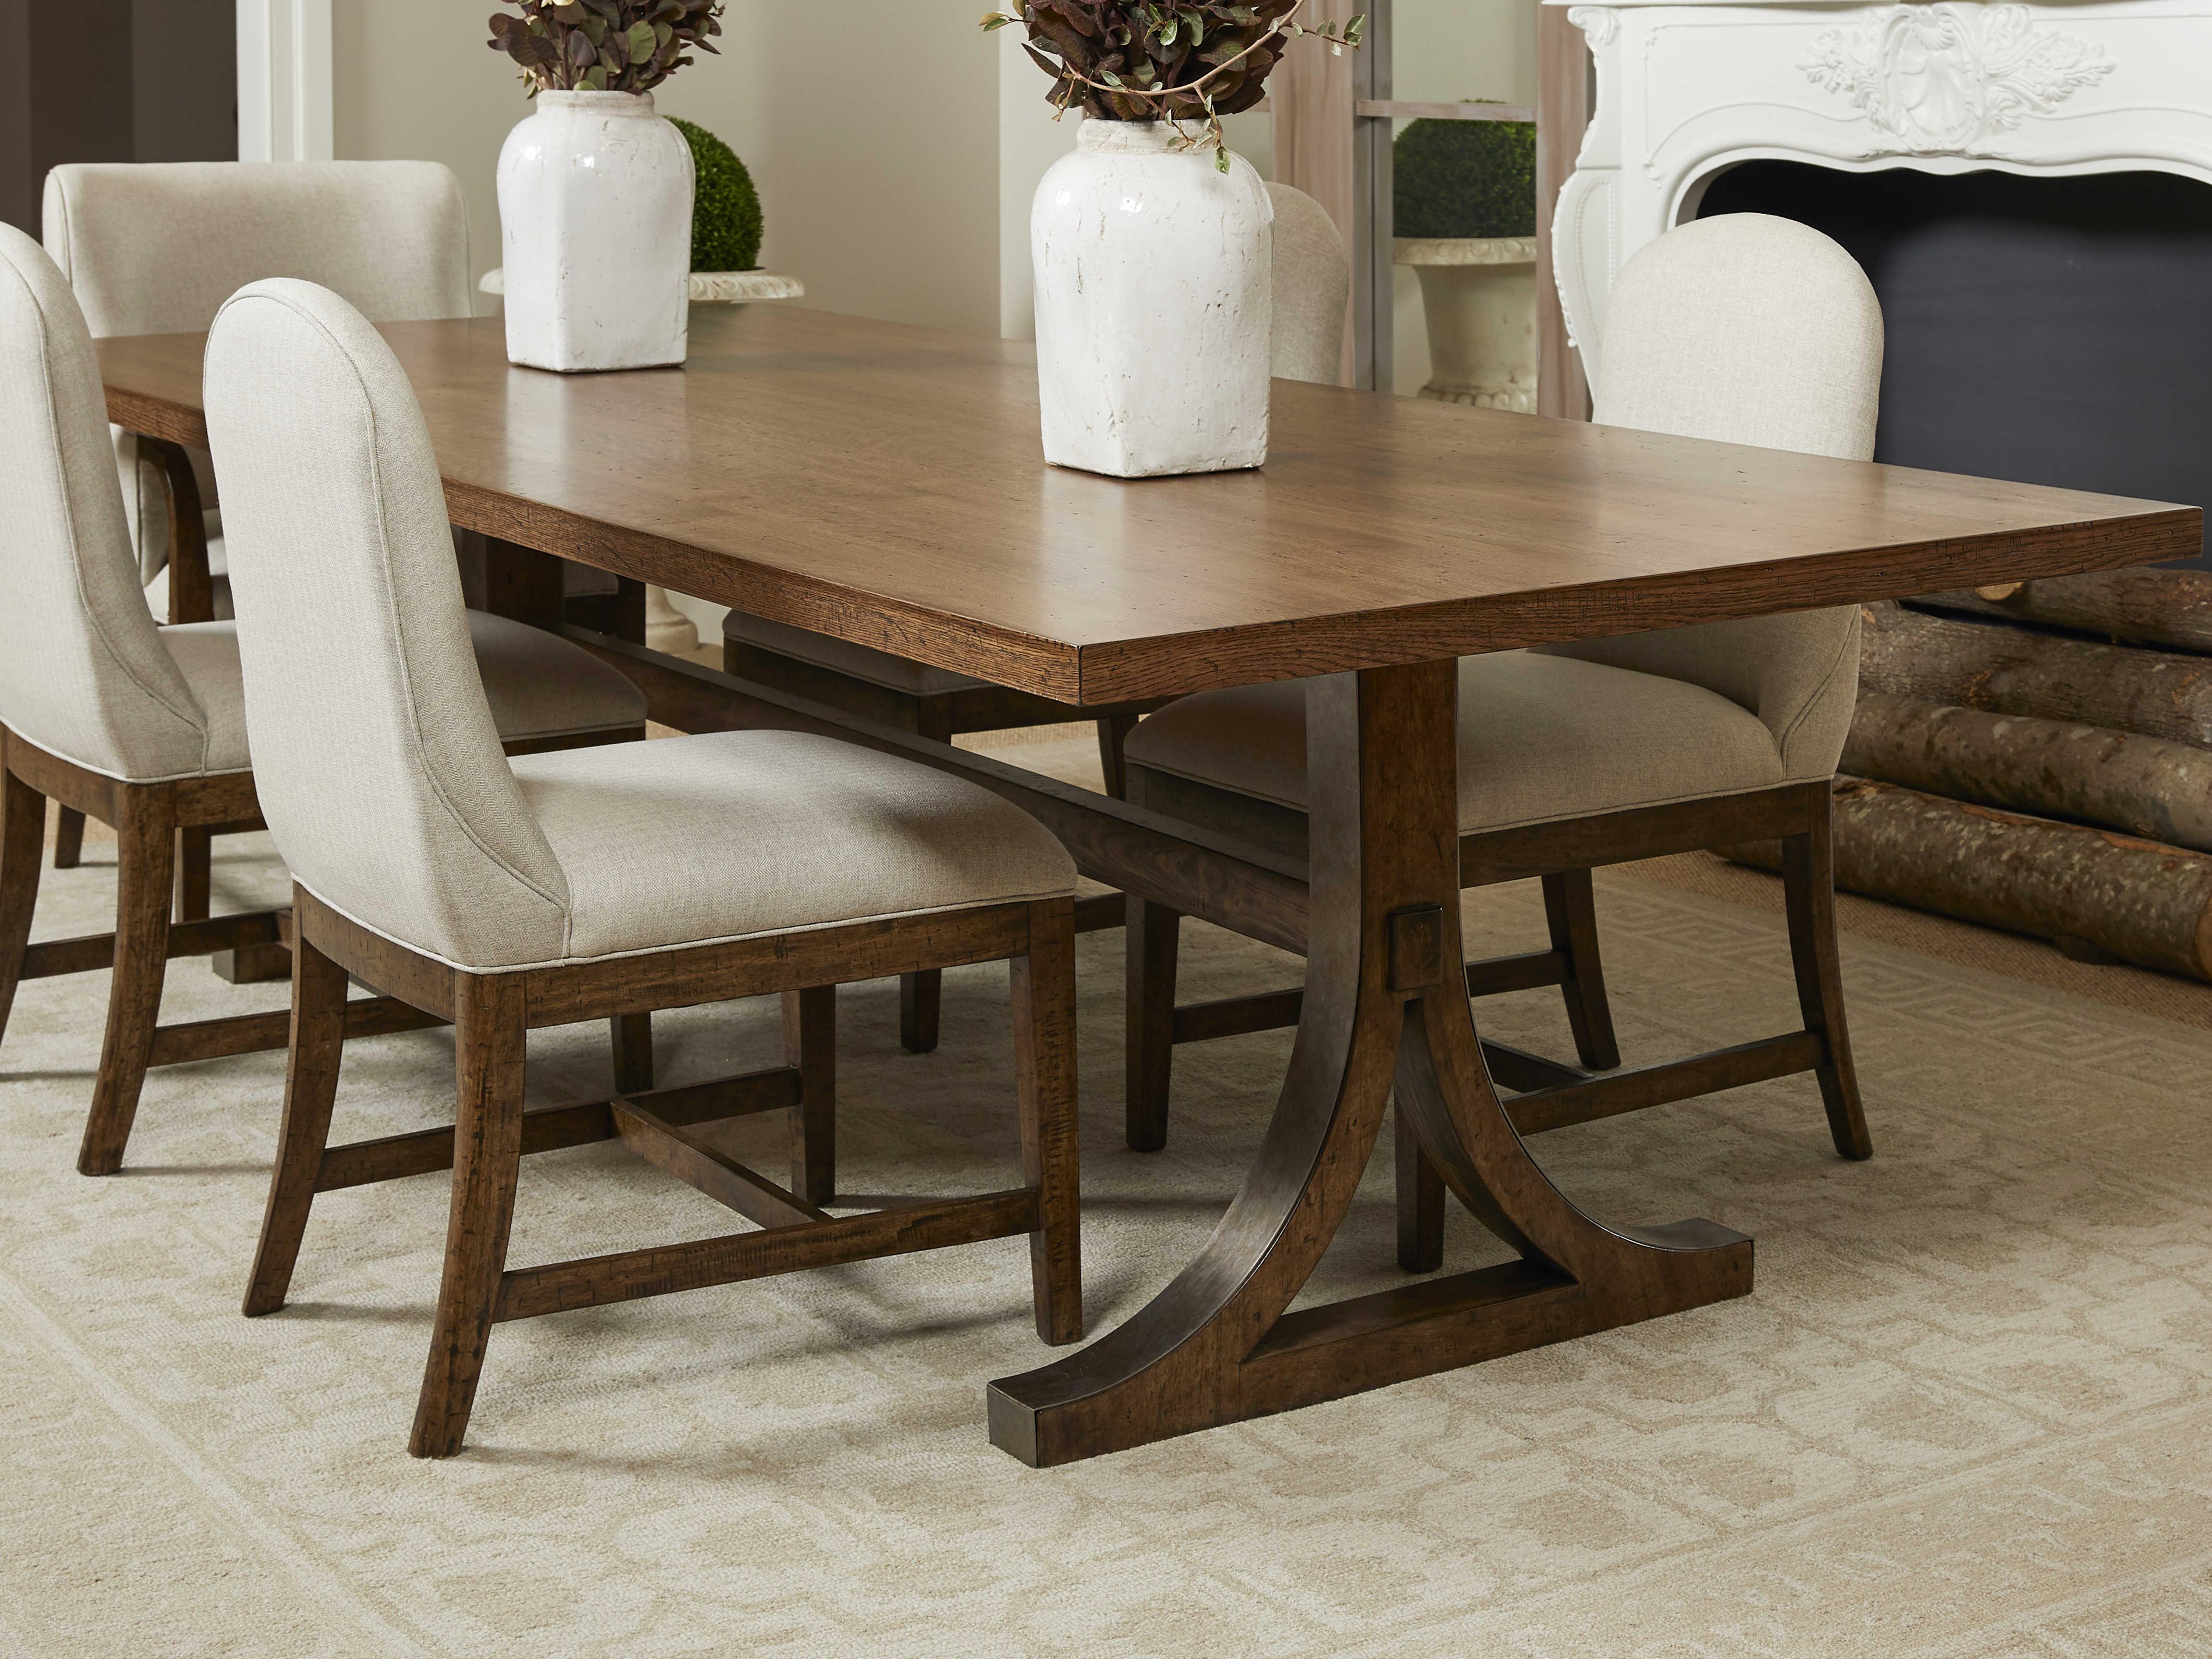 Stanley Furniture Hillside 108 Wide Rectangular Dining Table Sl811c137